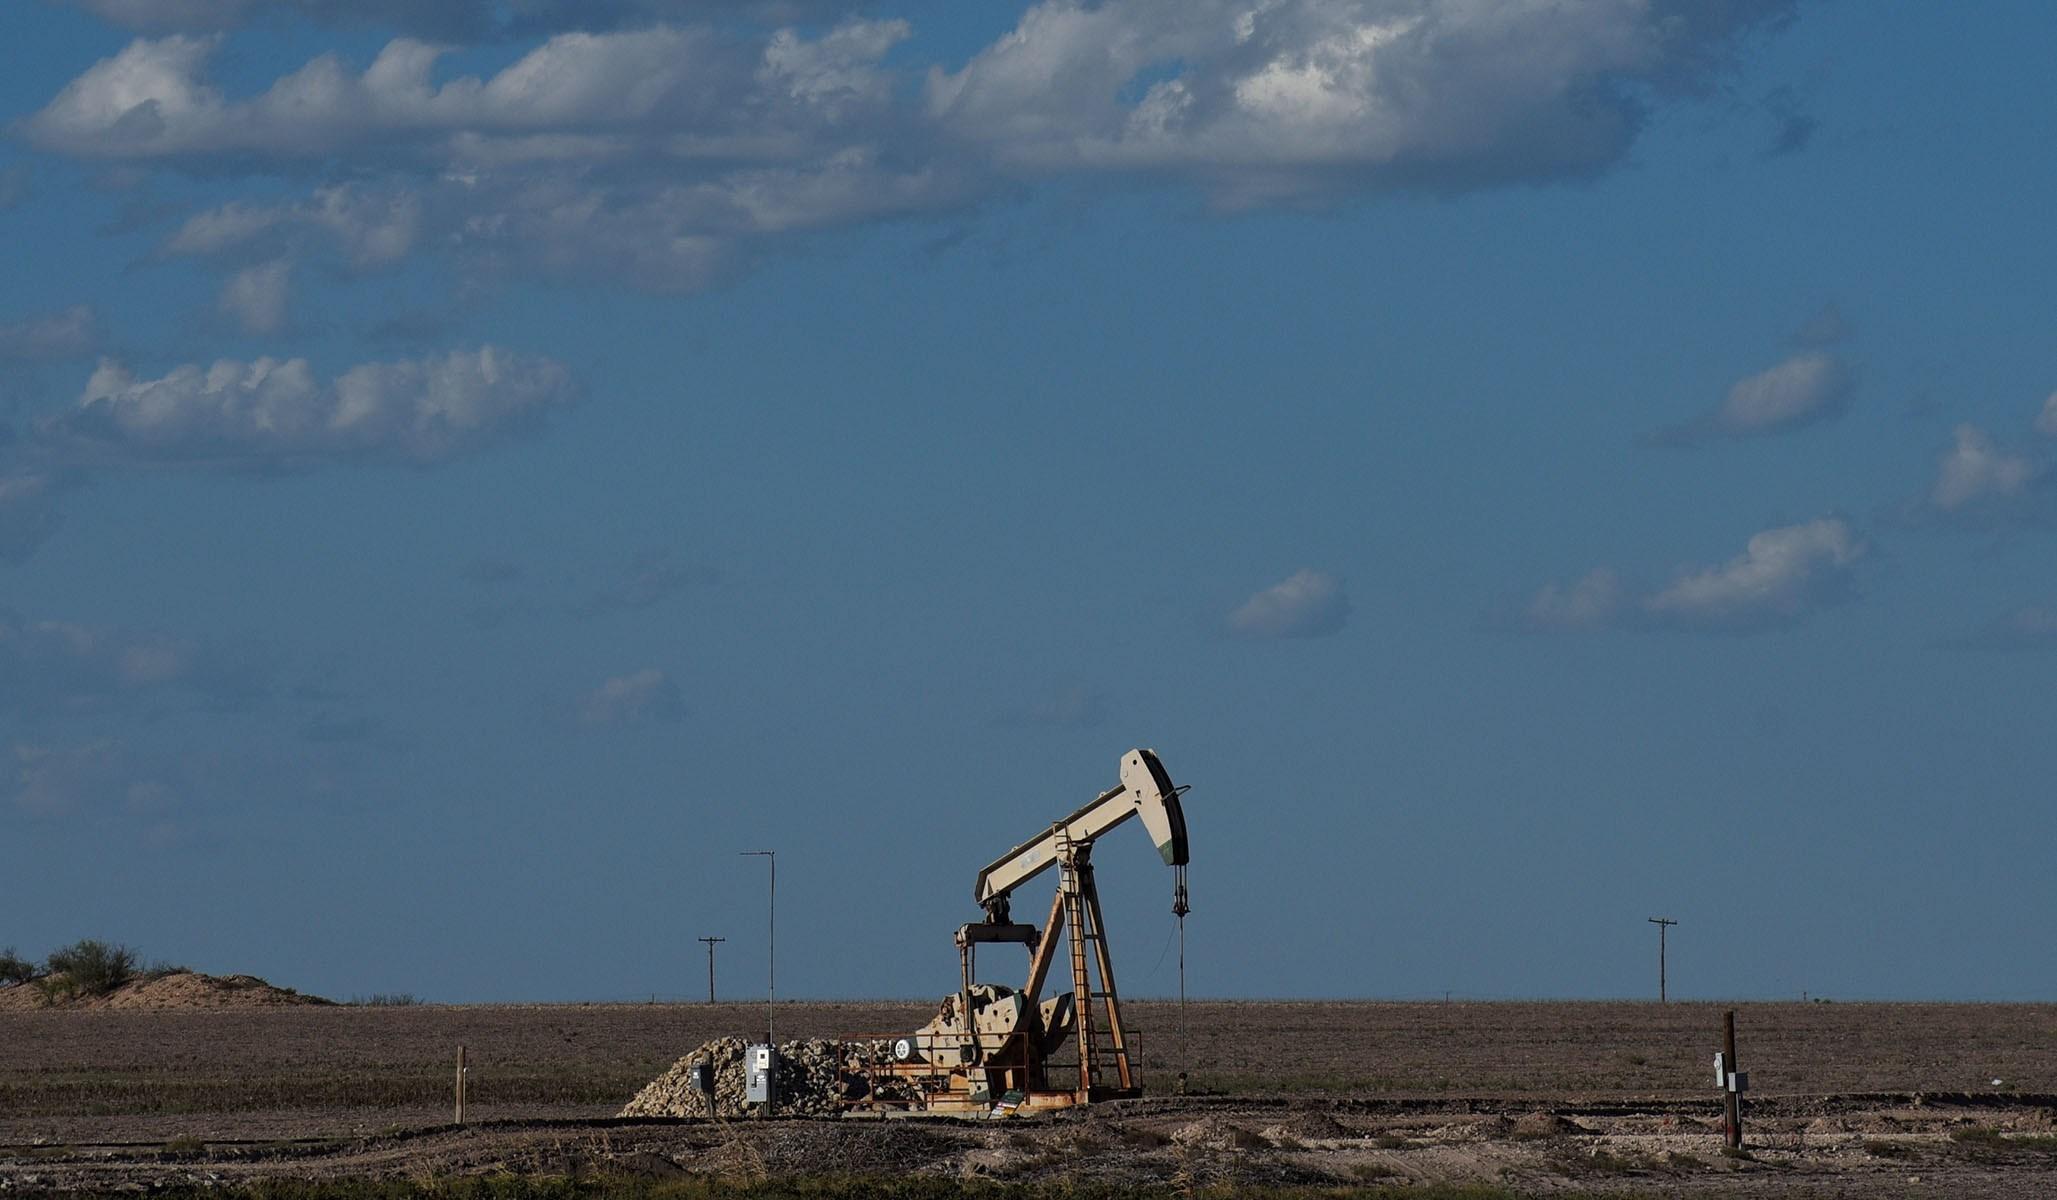 The U.S. Refineries Are Facing Crude Oil Shortage